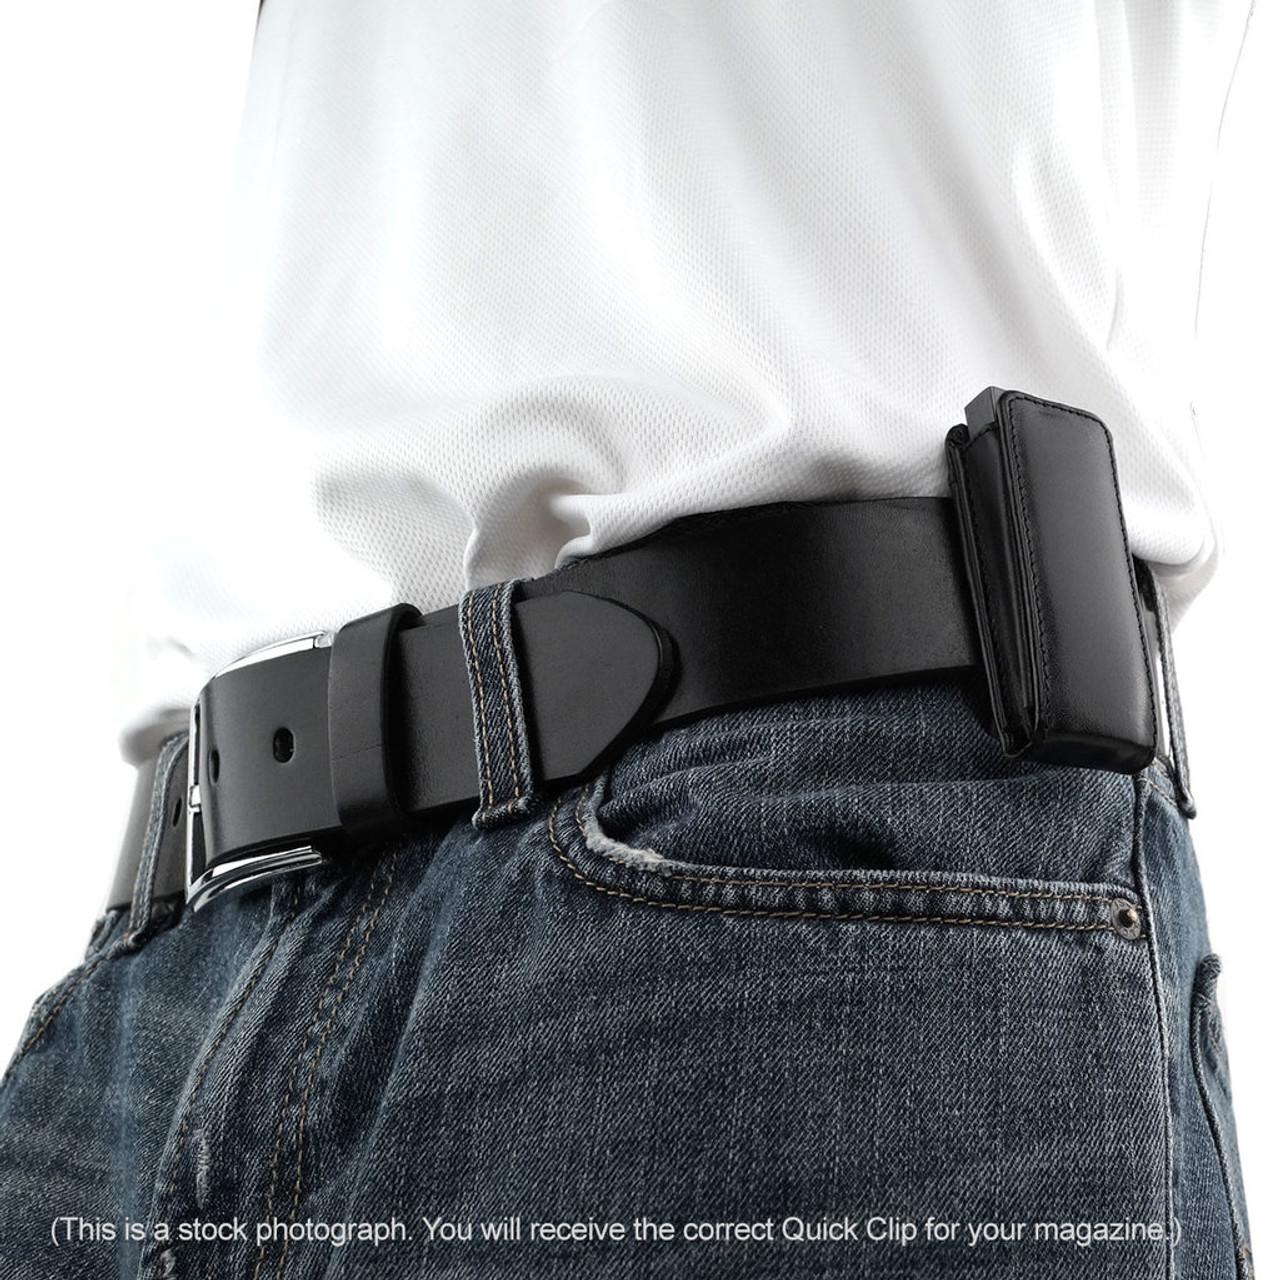 Glock 33 Quick Clip Magazine Holster